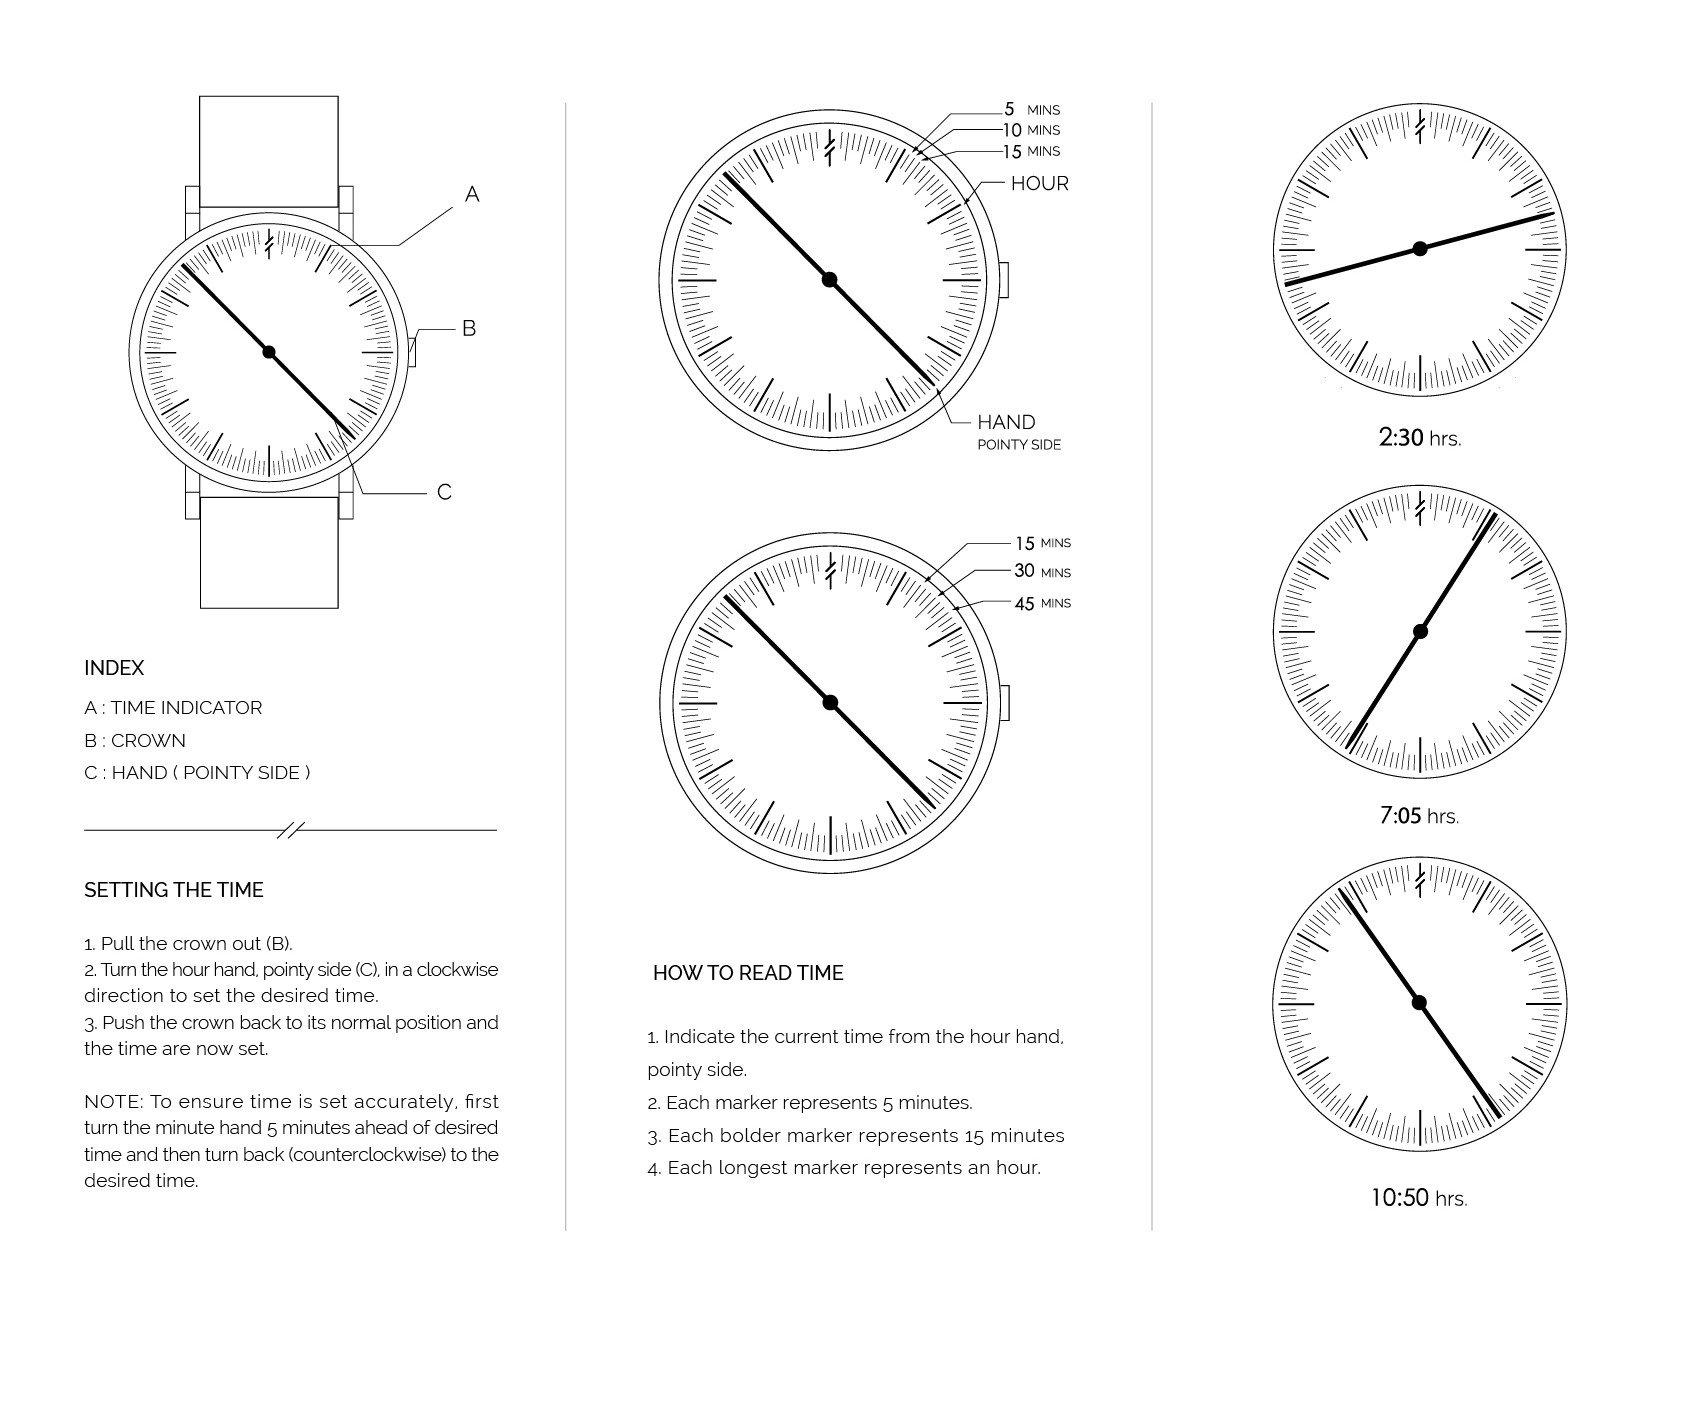 One_Collection_Manual_82368fc7-47c4-401f-a22d-f823b24d9d0a